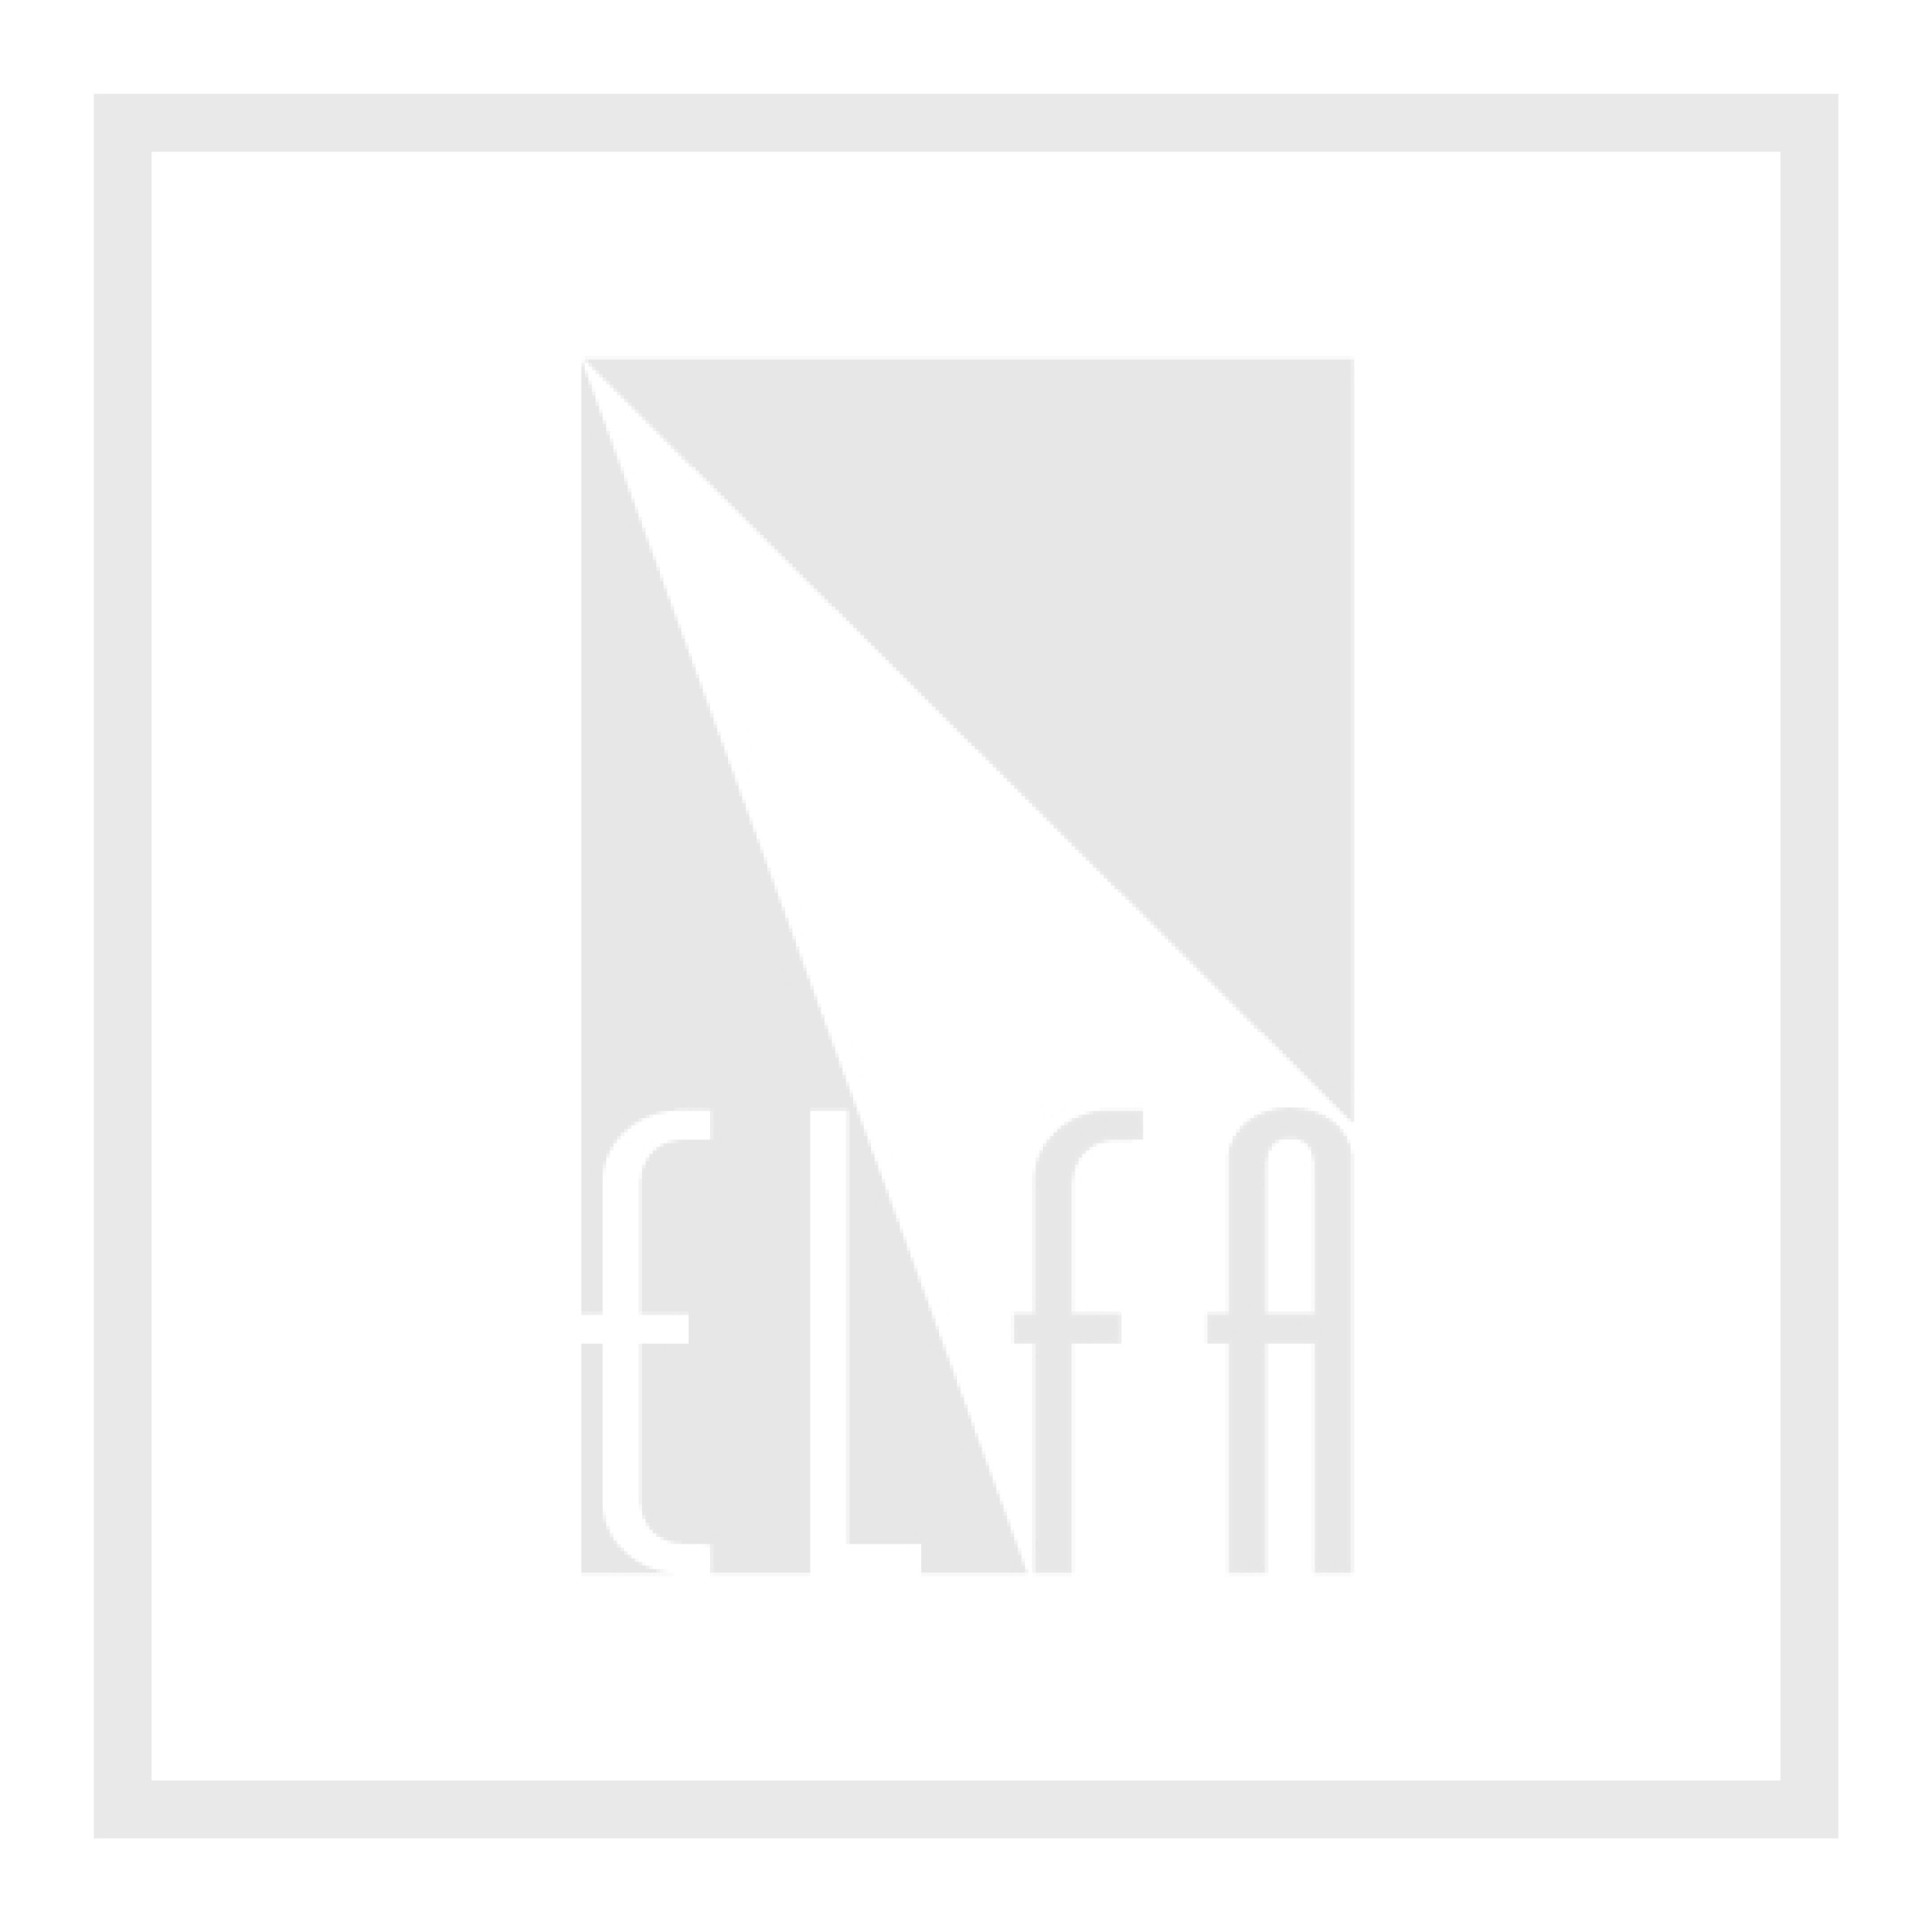 Saft Lithium ThyChl batt C basic 3,6V LSH14CFG